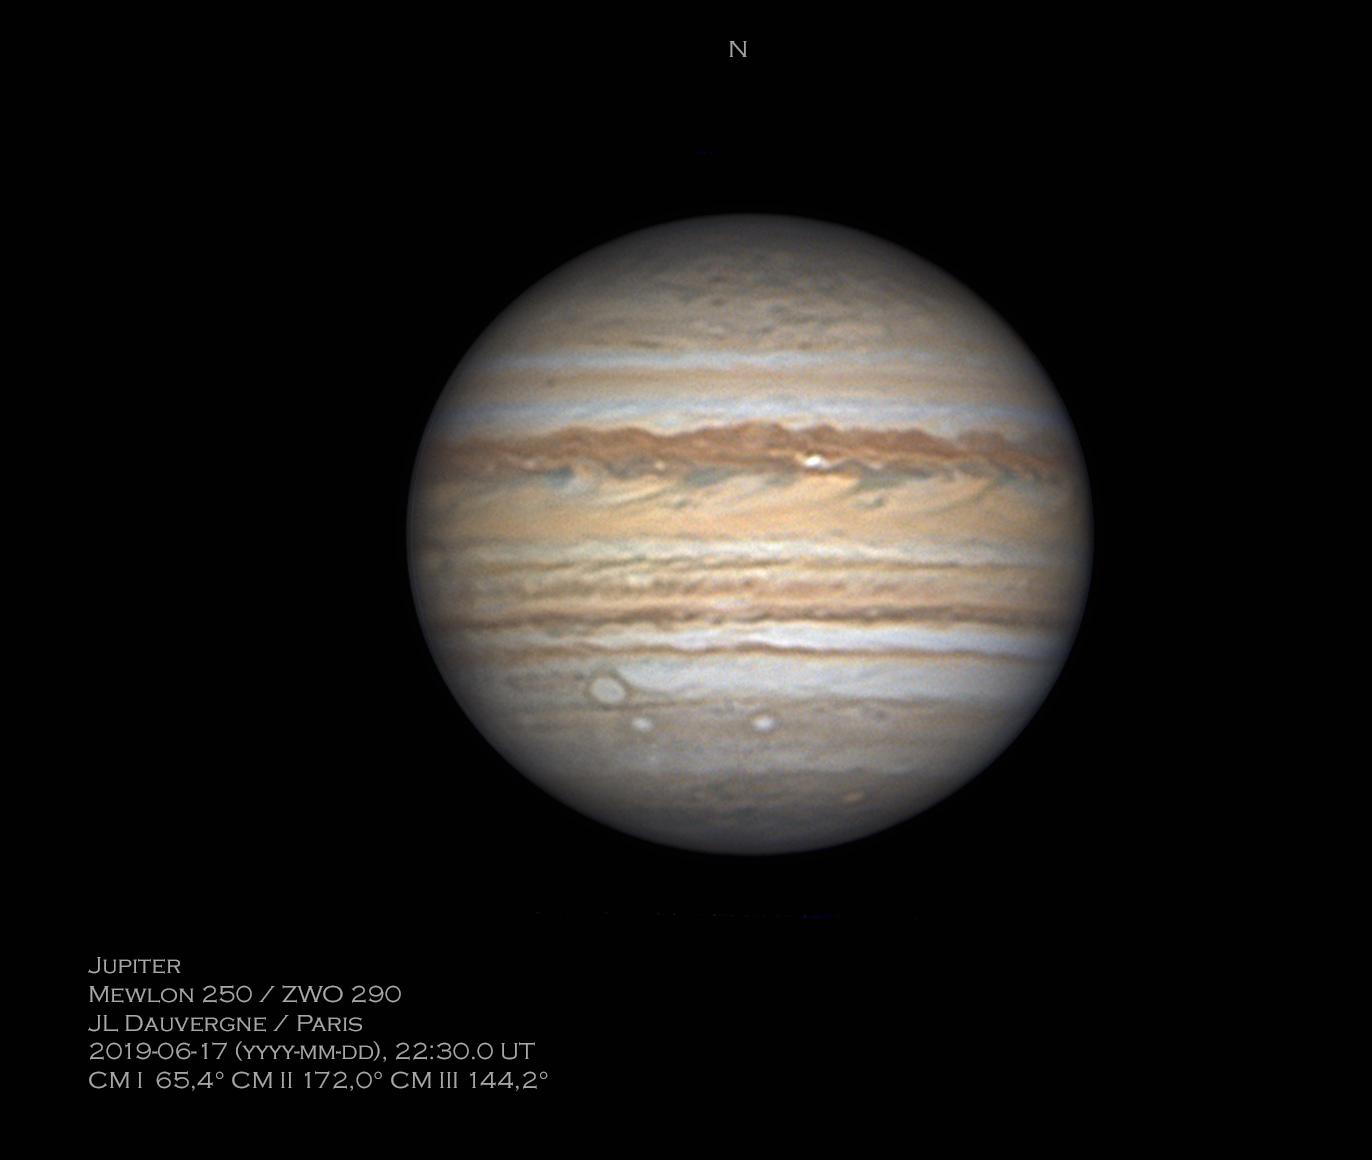 5d0968965c4ad_2019-06-17-2230_0-L-Jupiter_ZWOASI290MMMini_lapl6_ap200copie.jpg.581157a321d0314cf05bee3419e654fa.jpg